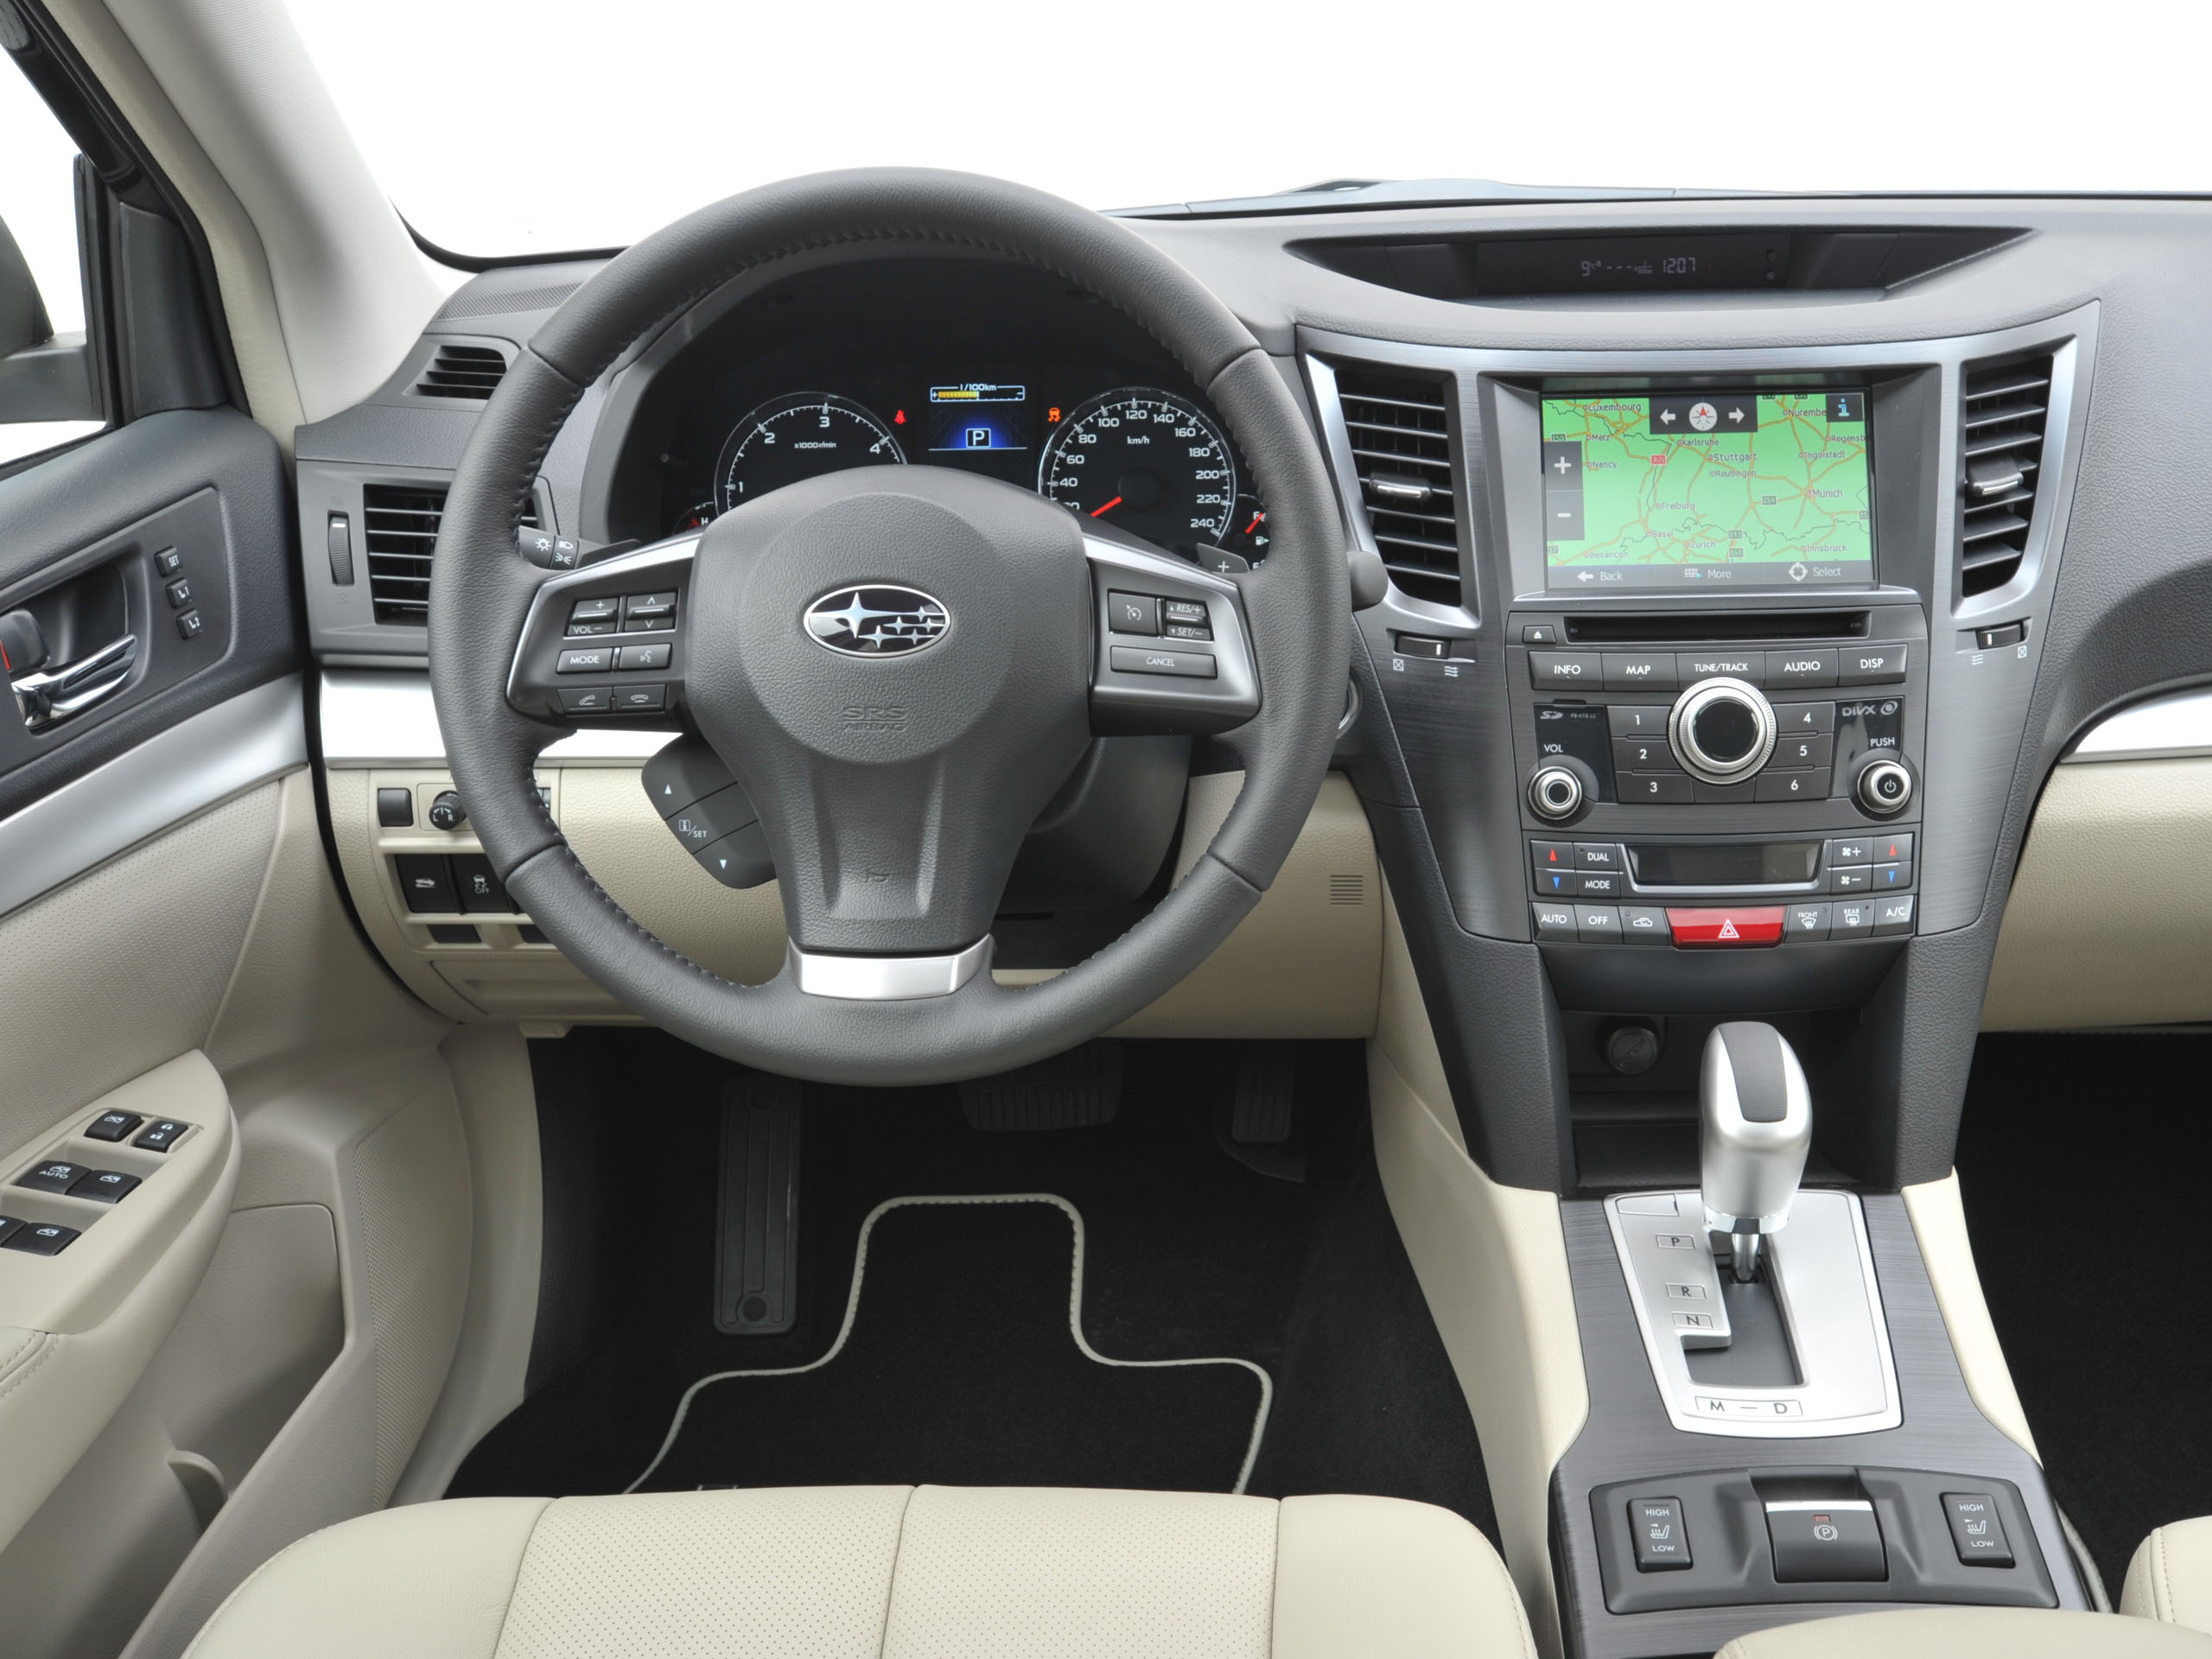 Fahrbericht Subaru Outback 2 0D 2013 Bilder und technische Daten